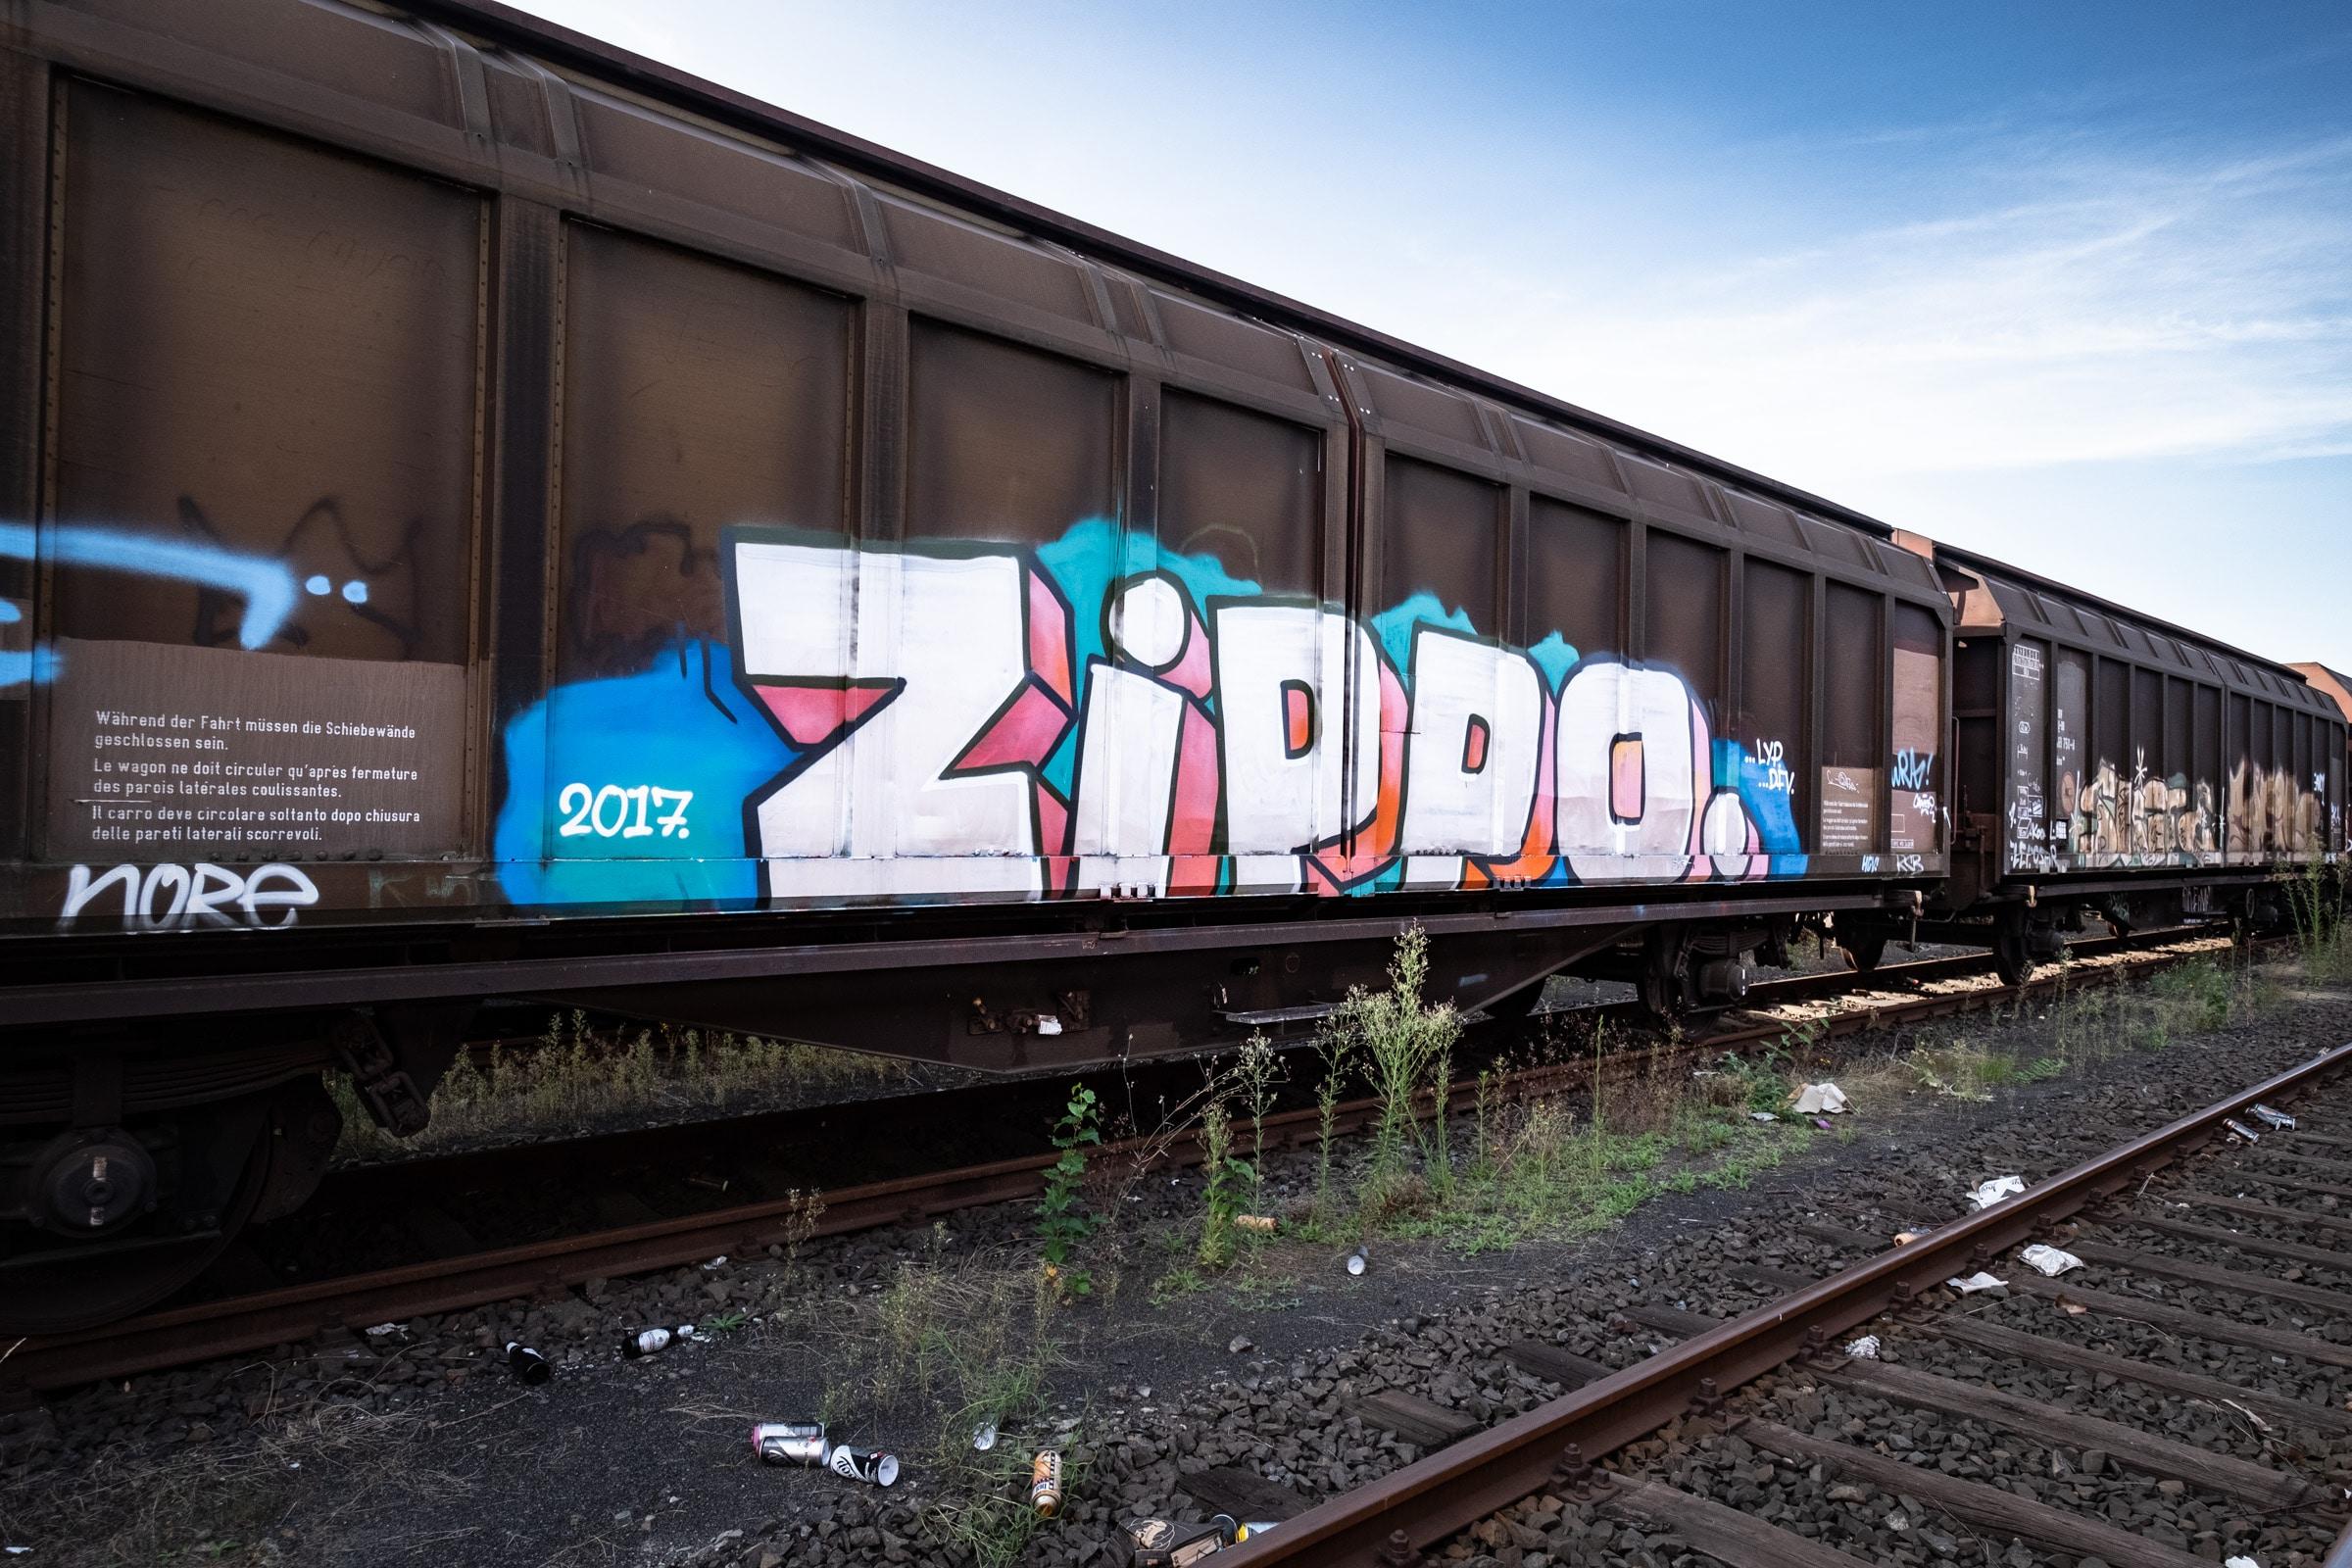 freight-graffiti-koeln-kalk-092020-1492.jpeg